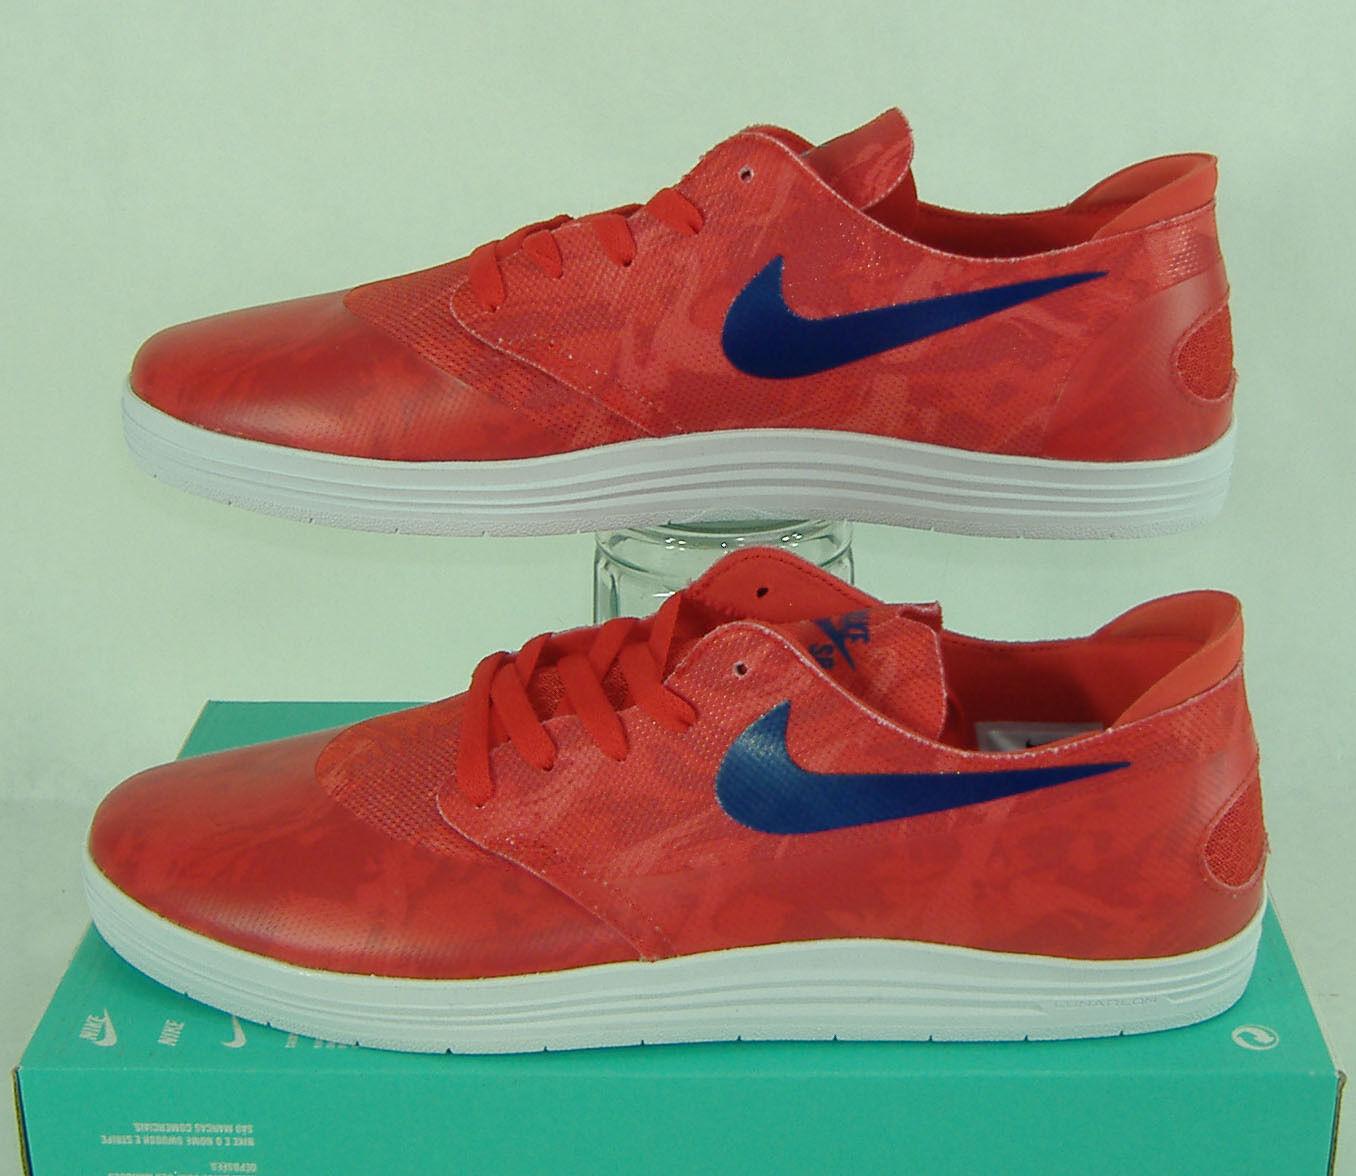 Nuevo Hombre 13 Nike SB Lunar Oneshot SB Zapatos WC Rojo Azul Skate Zapatos SB  2018 645019 604 db0590